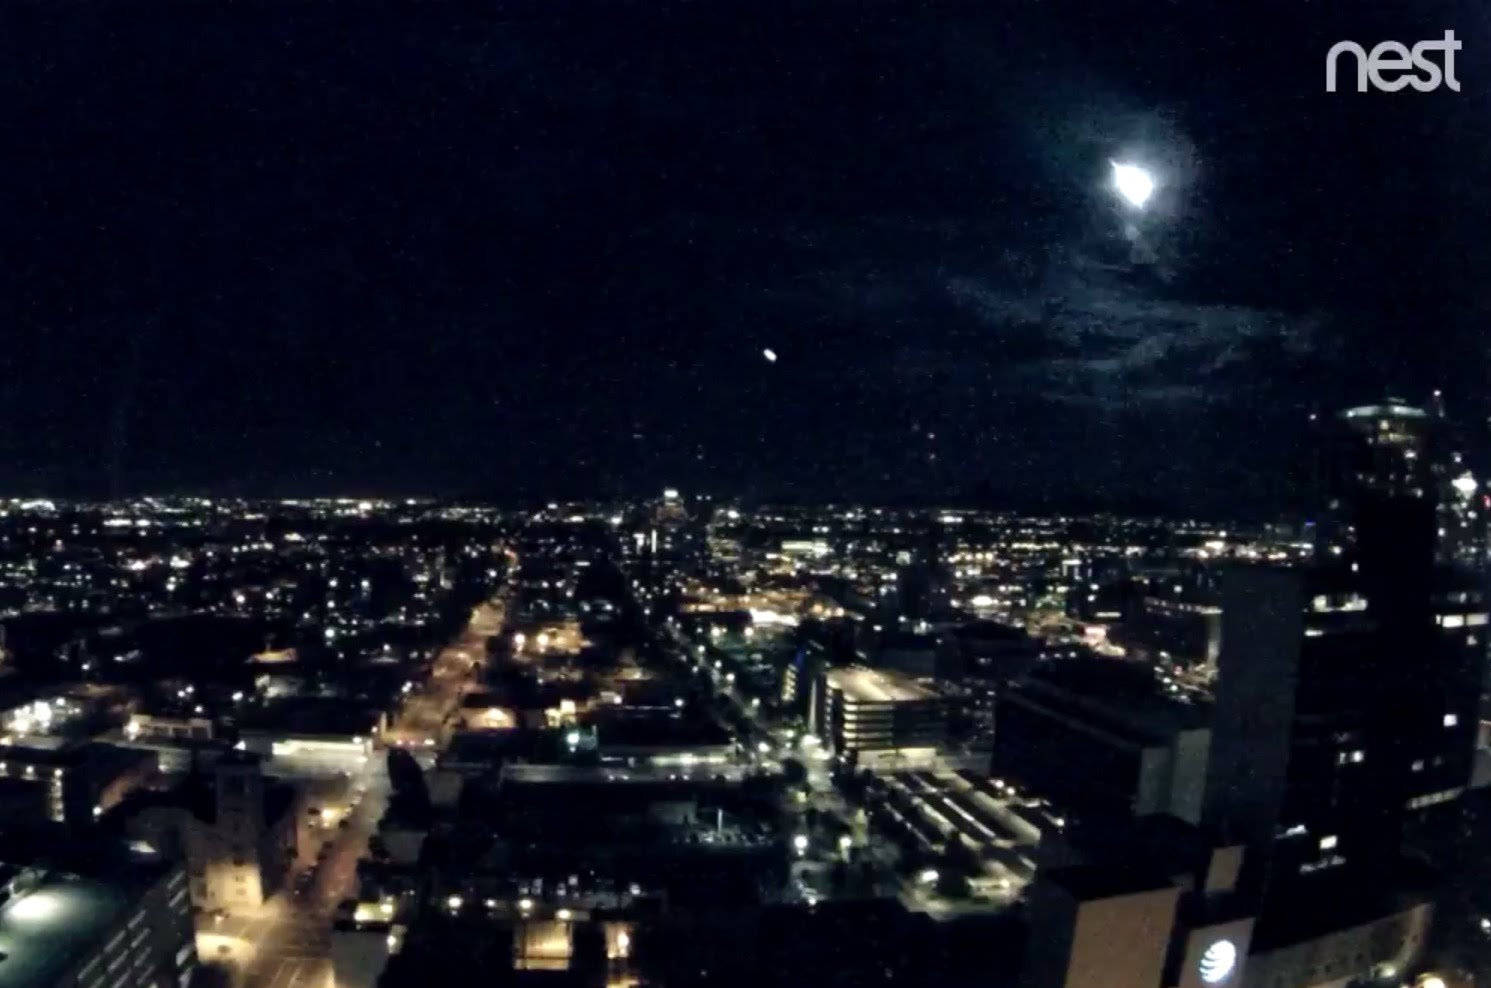 Caption: The Phoenix CityCam caught the flash of light around 8:30 p.m. on Nov. 14, 2017, Credit: City of Phoenix